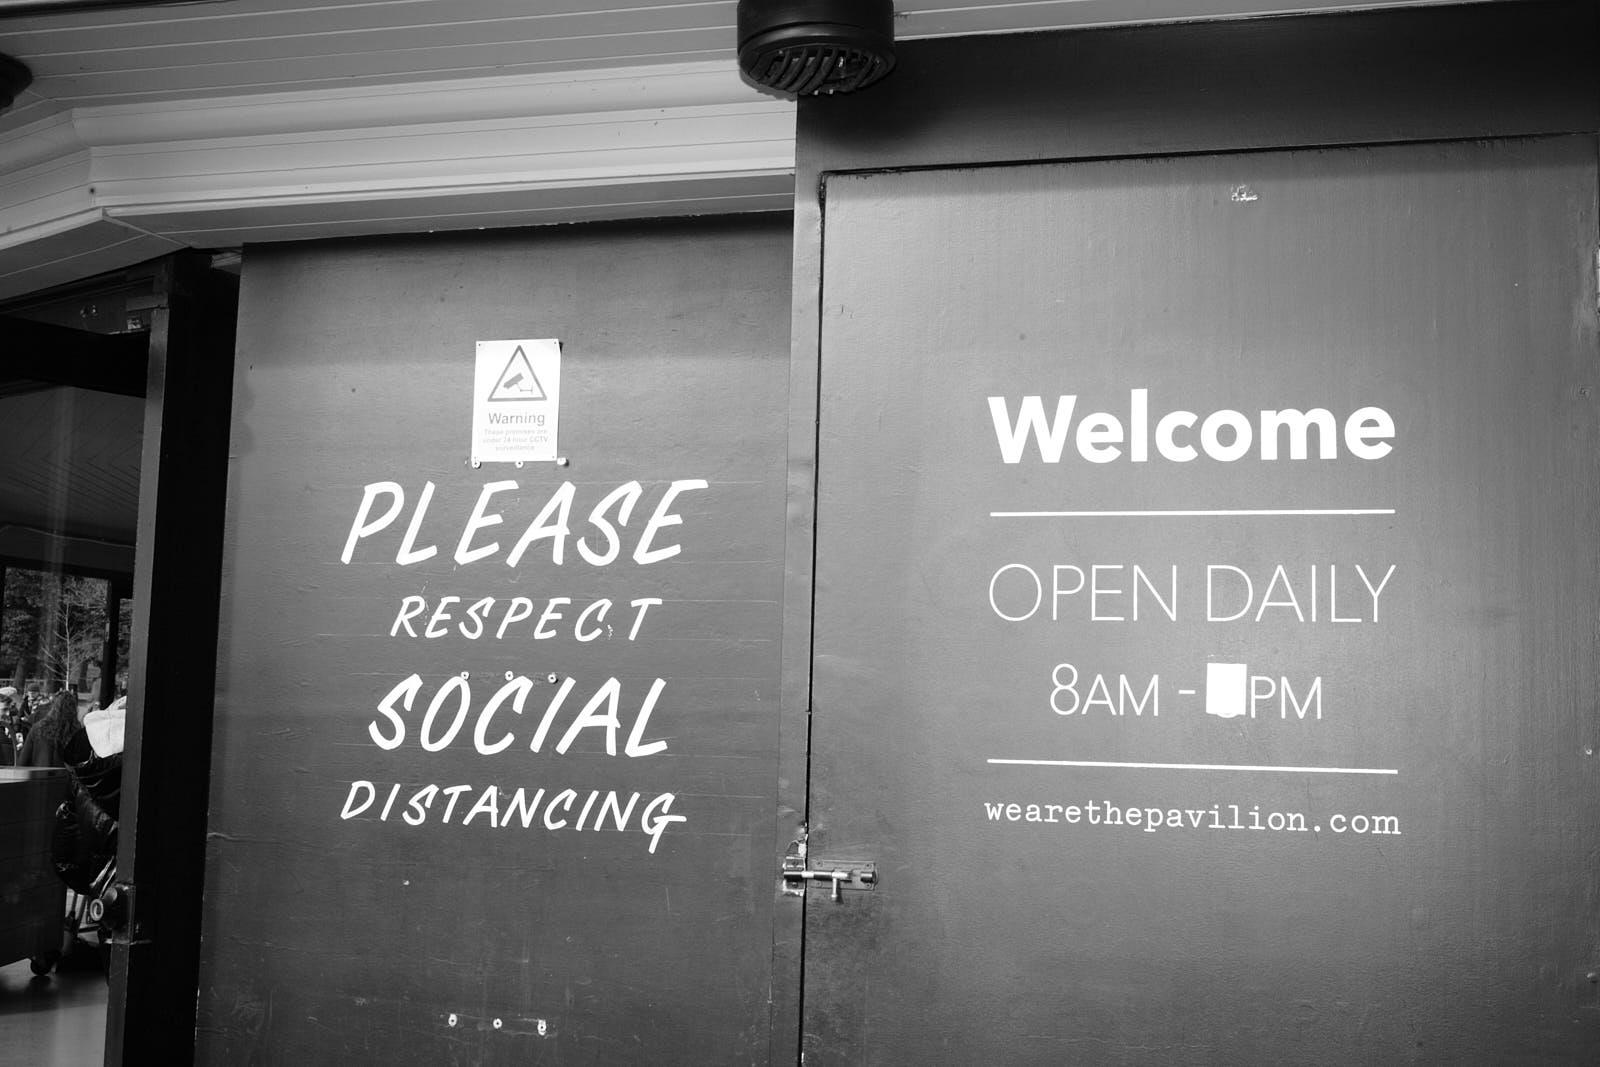 Social distancing signage on London restaurant Pavilion